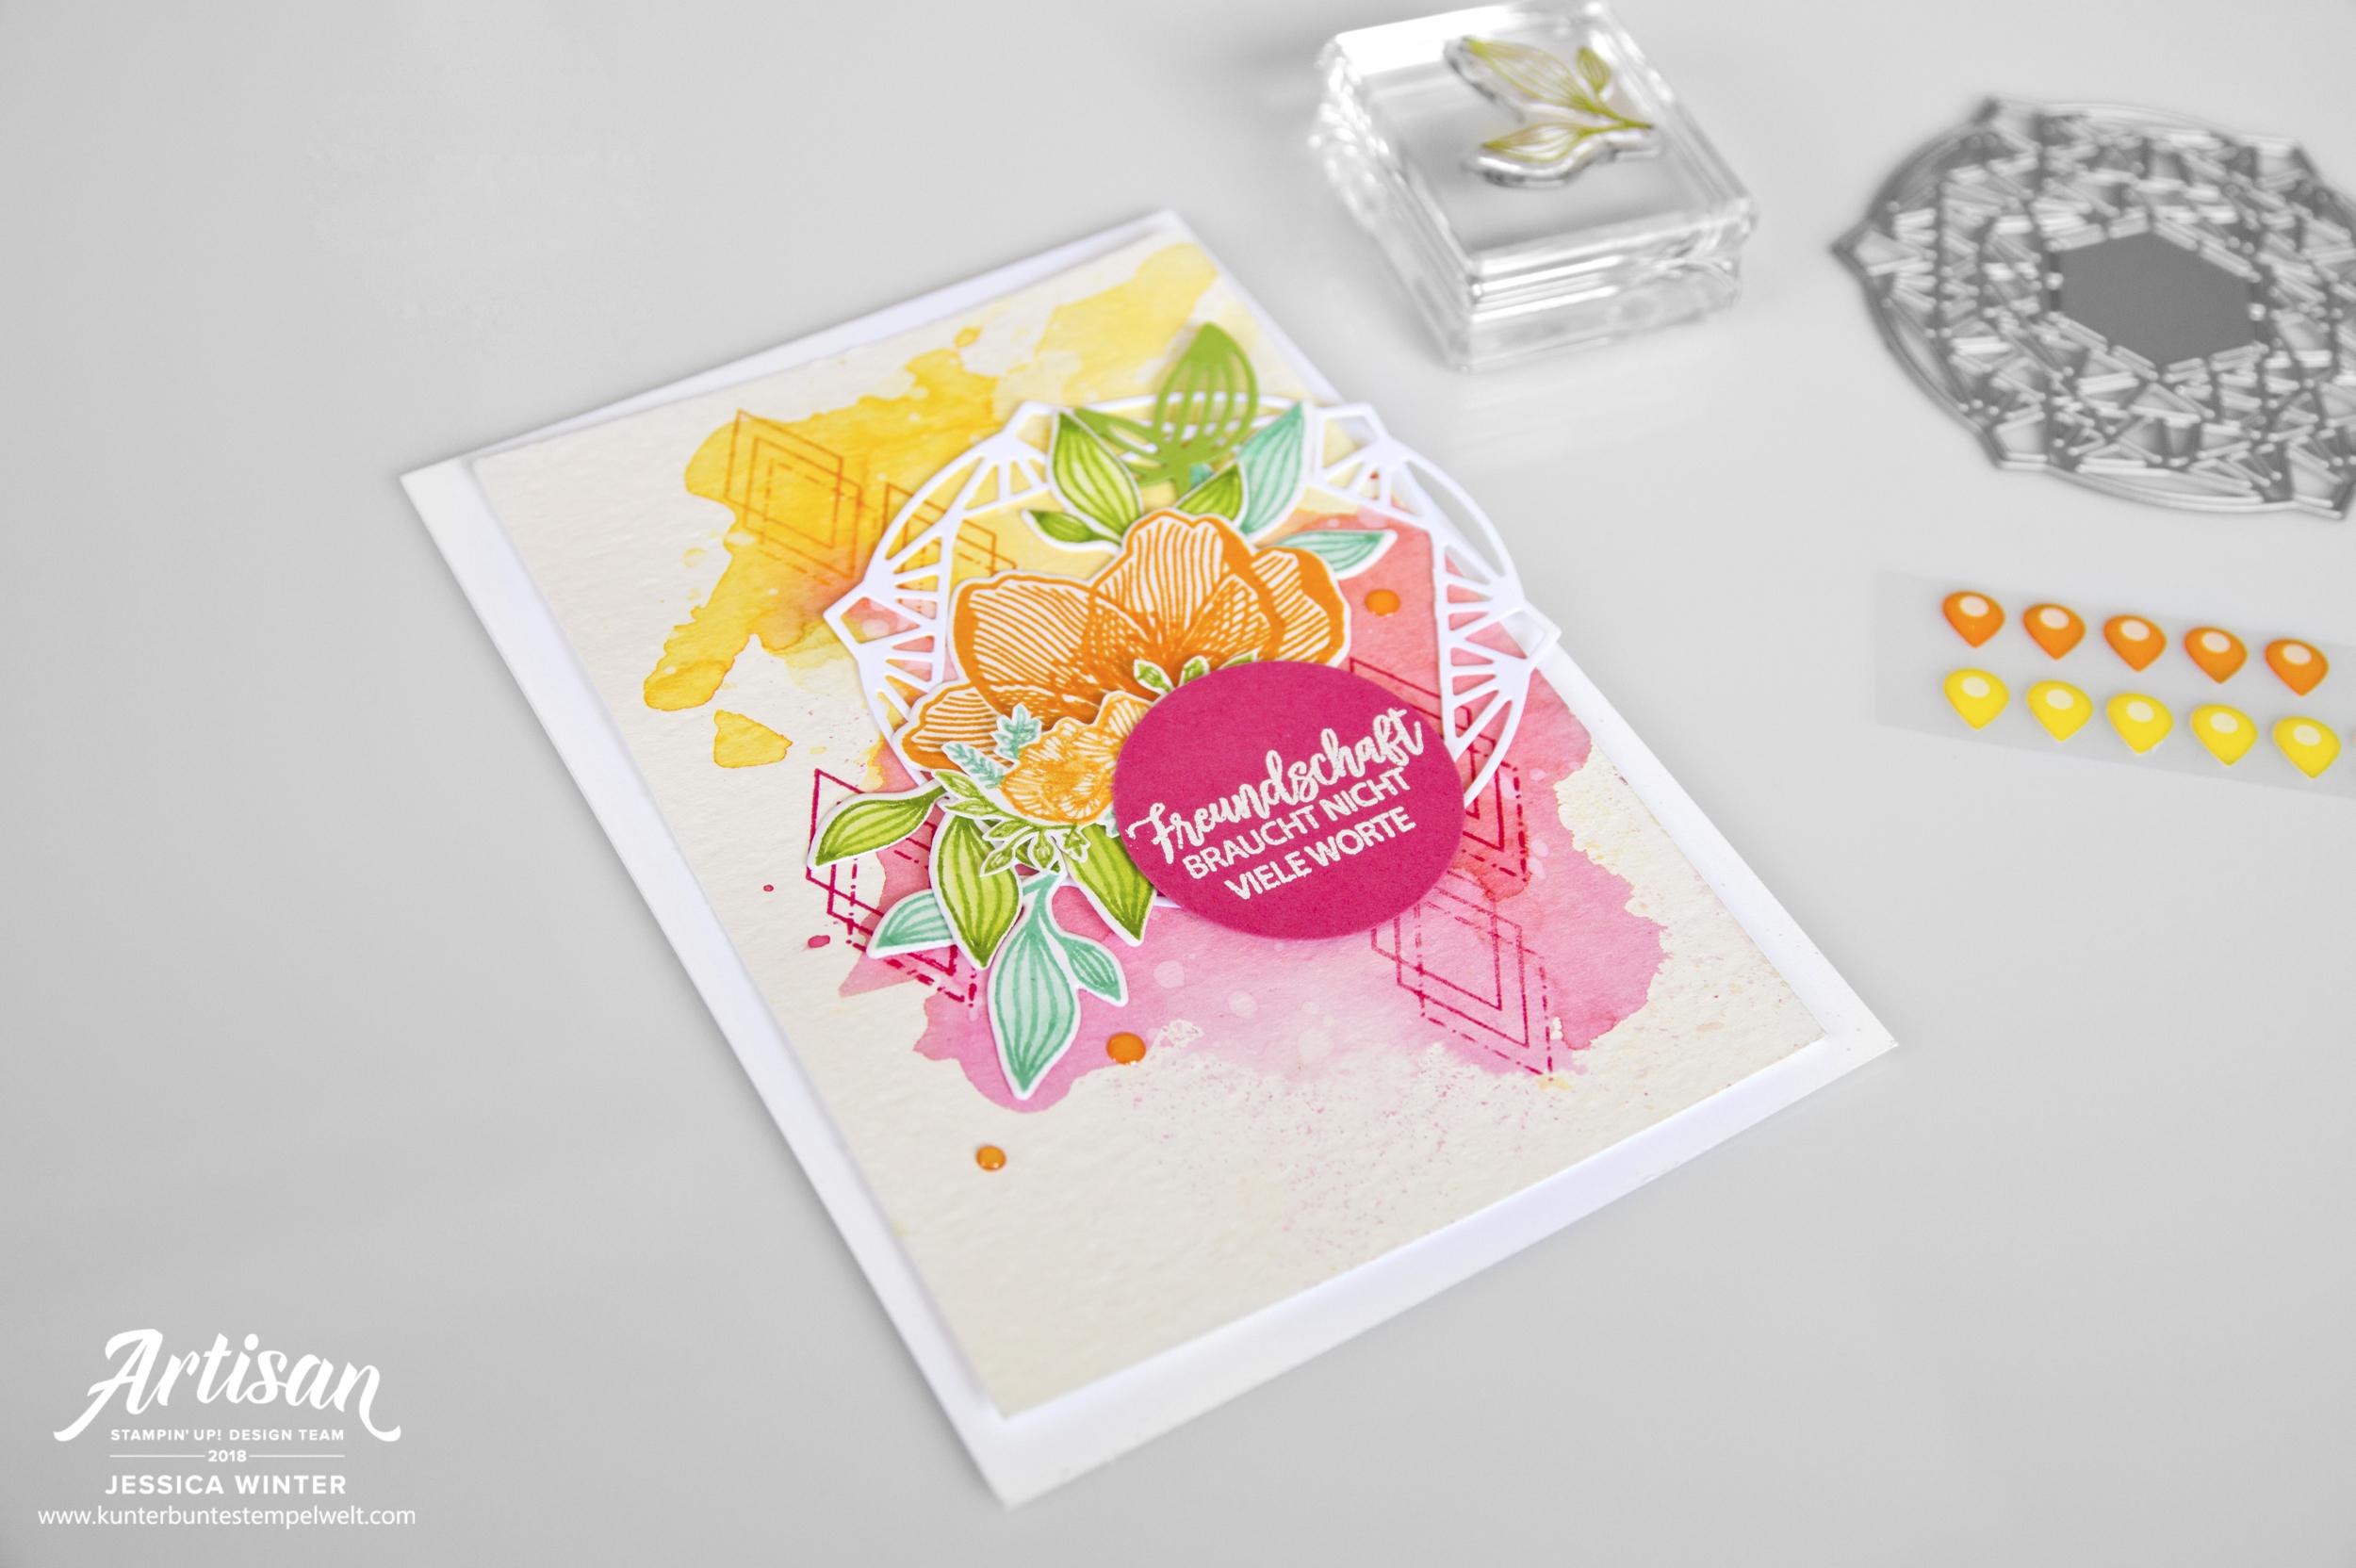 Stampin Up Artisan Blog Hop Blütenzauber Meine